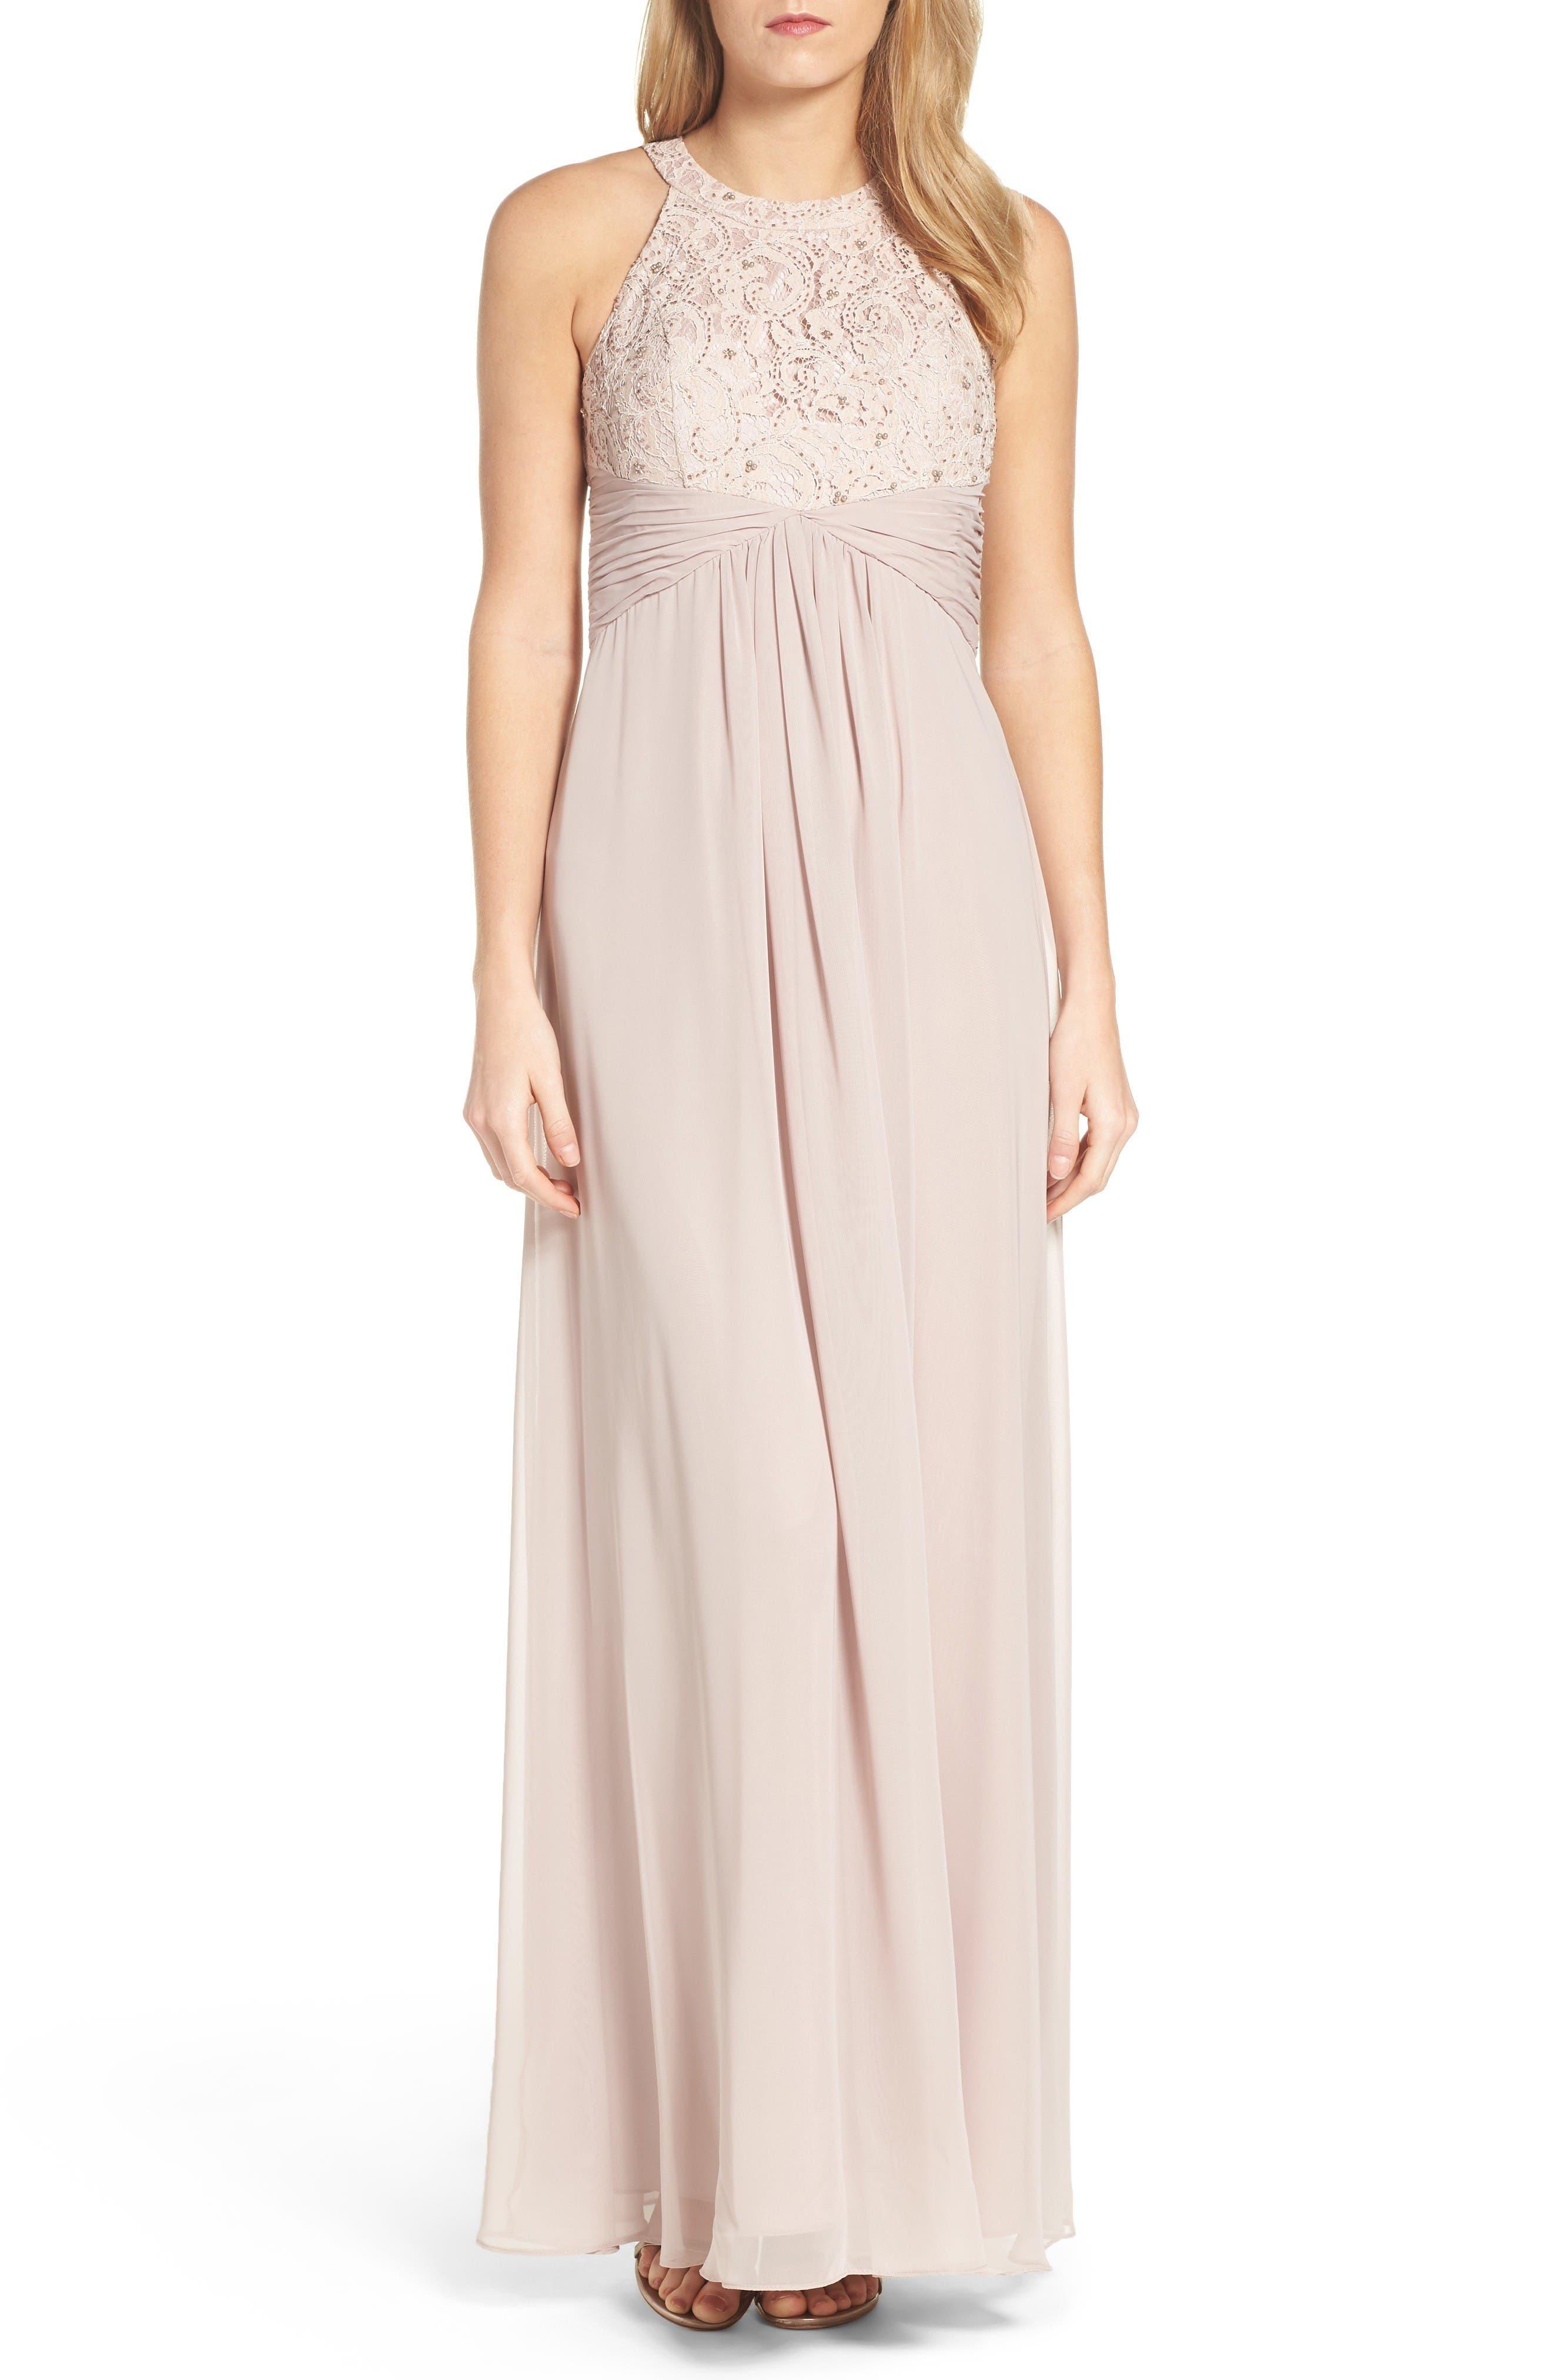 Main Image - Eliza J Beaded Lace & Chiffon Gown